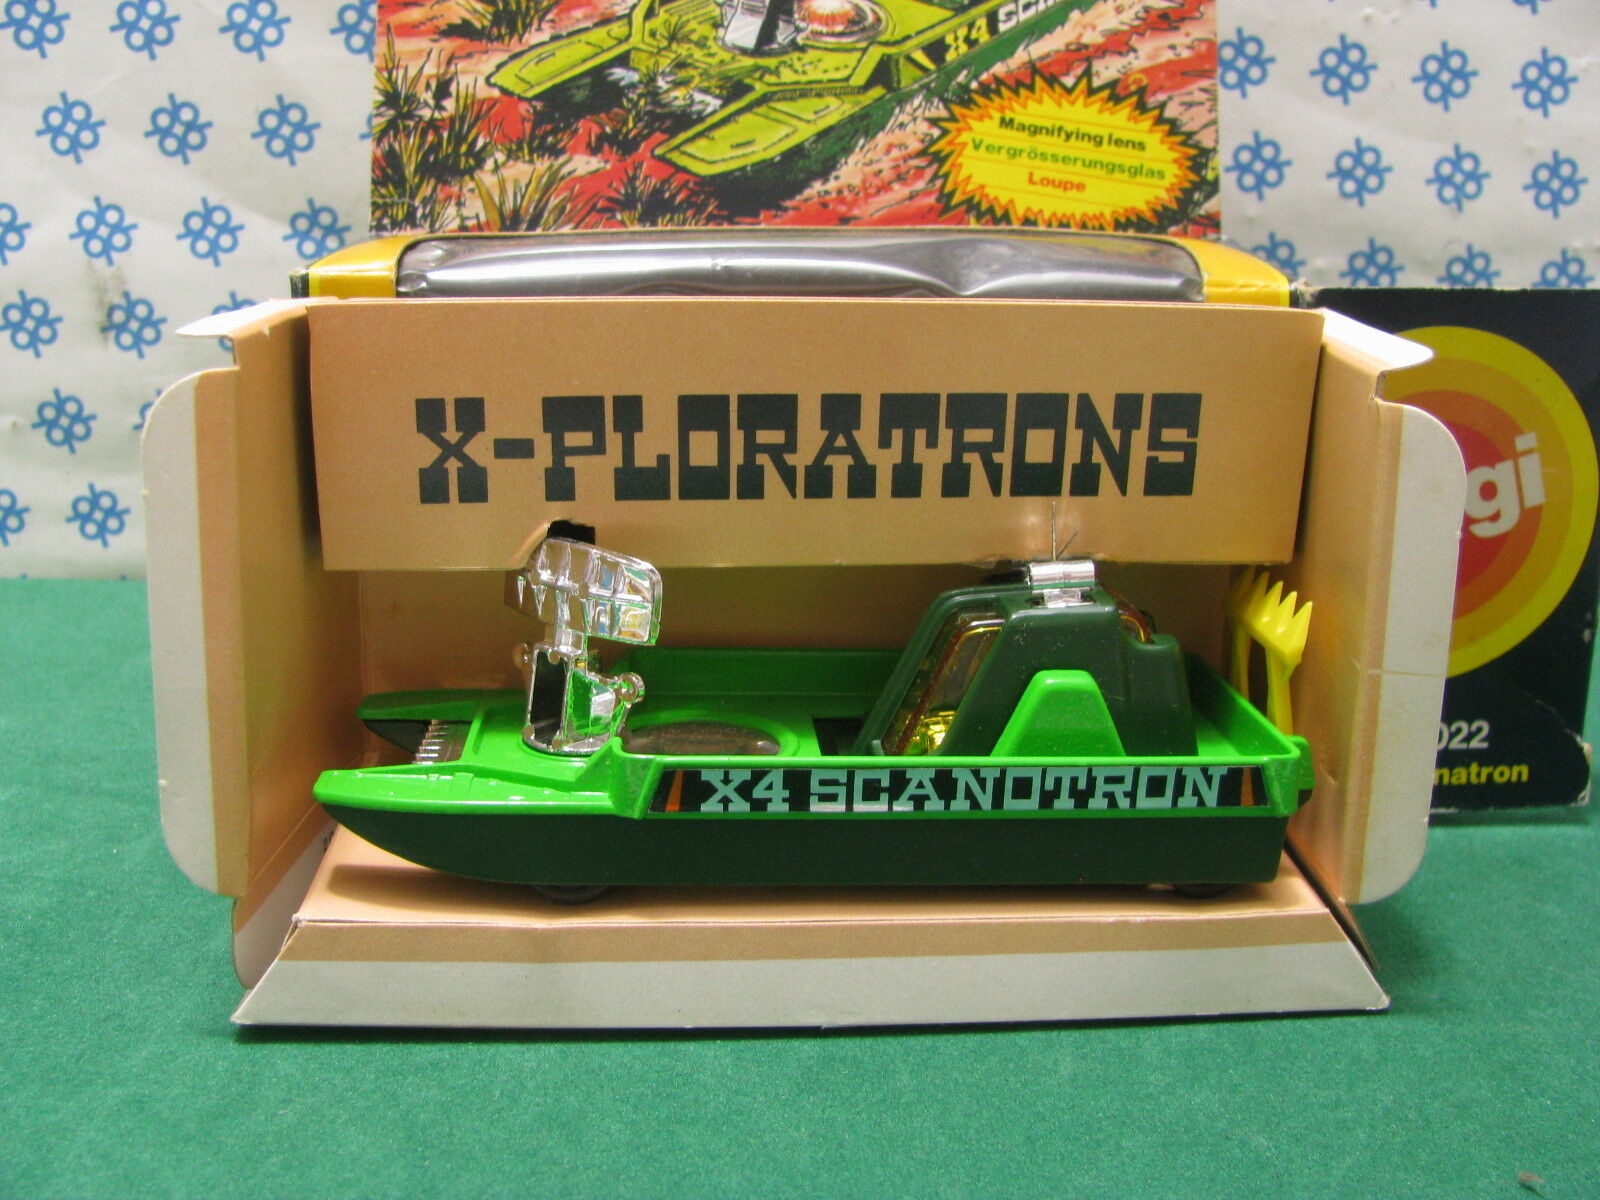 Vintage Corgi - X 4 SCANOTRON - CORGI The Mettoy D2022